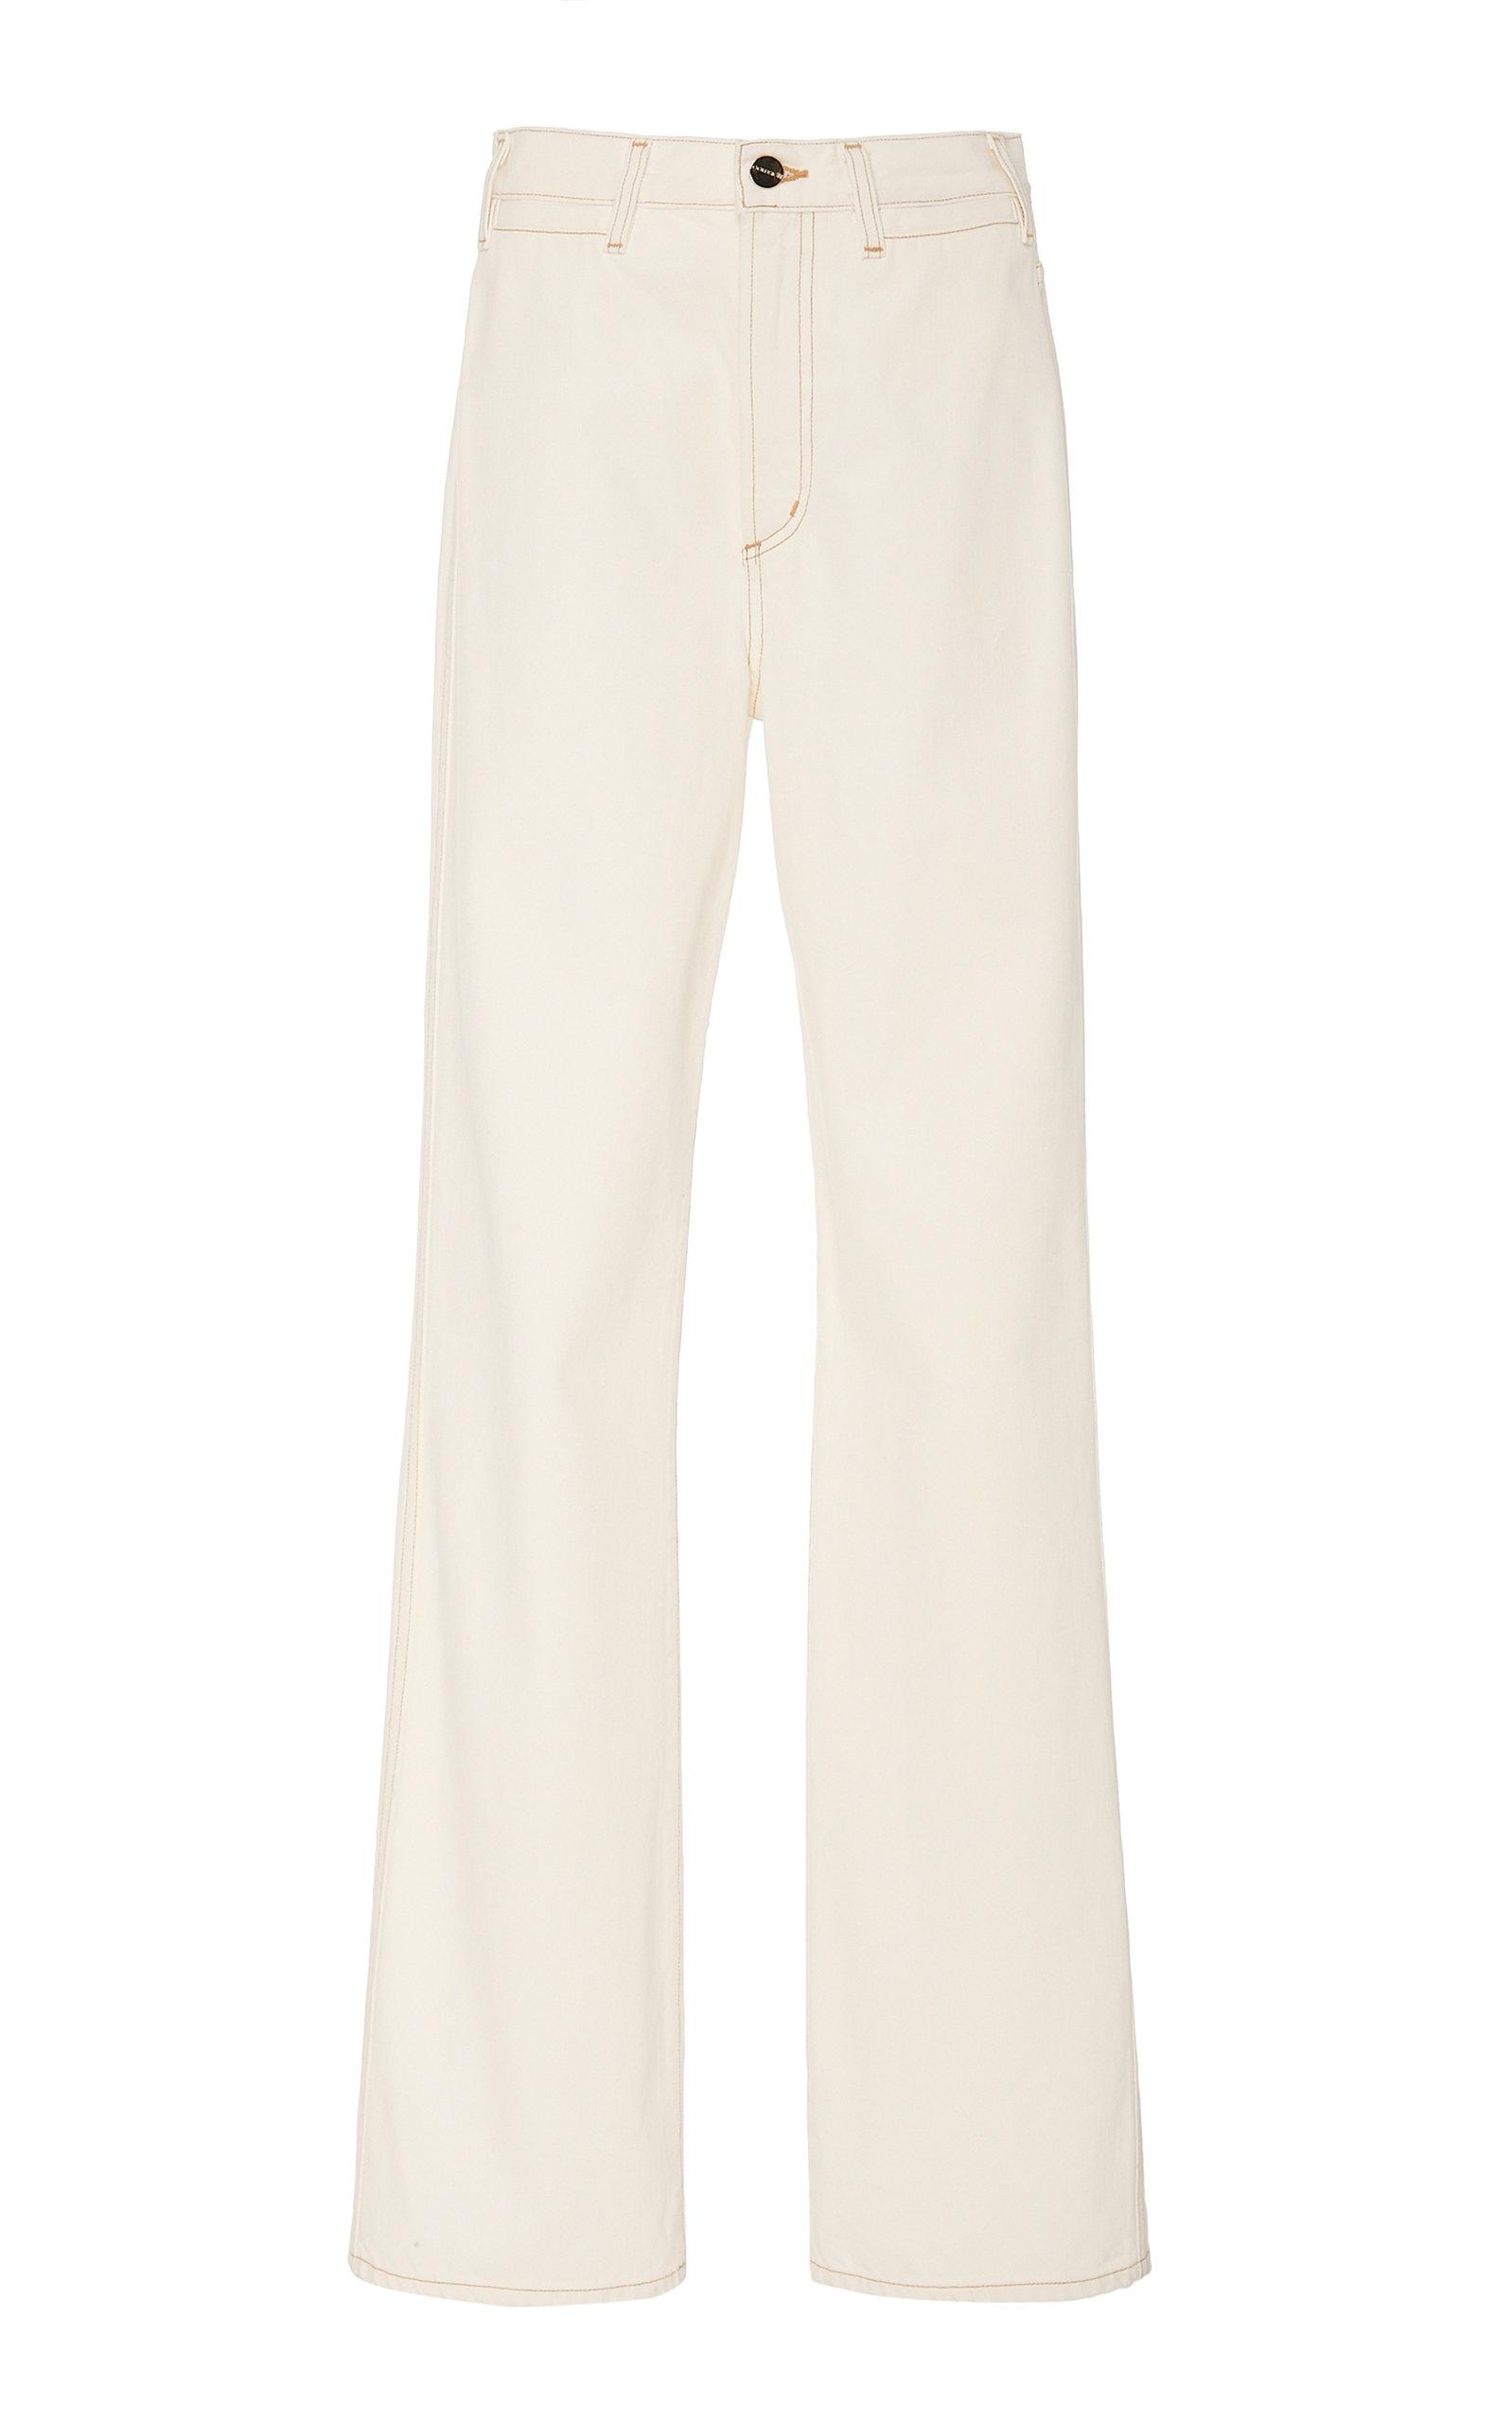 Goldsign The Welt Pocket Trouser